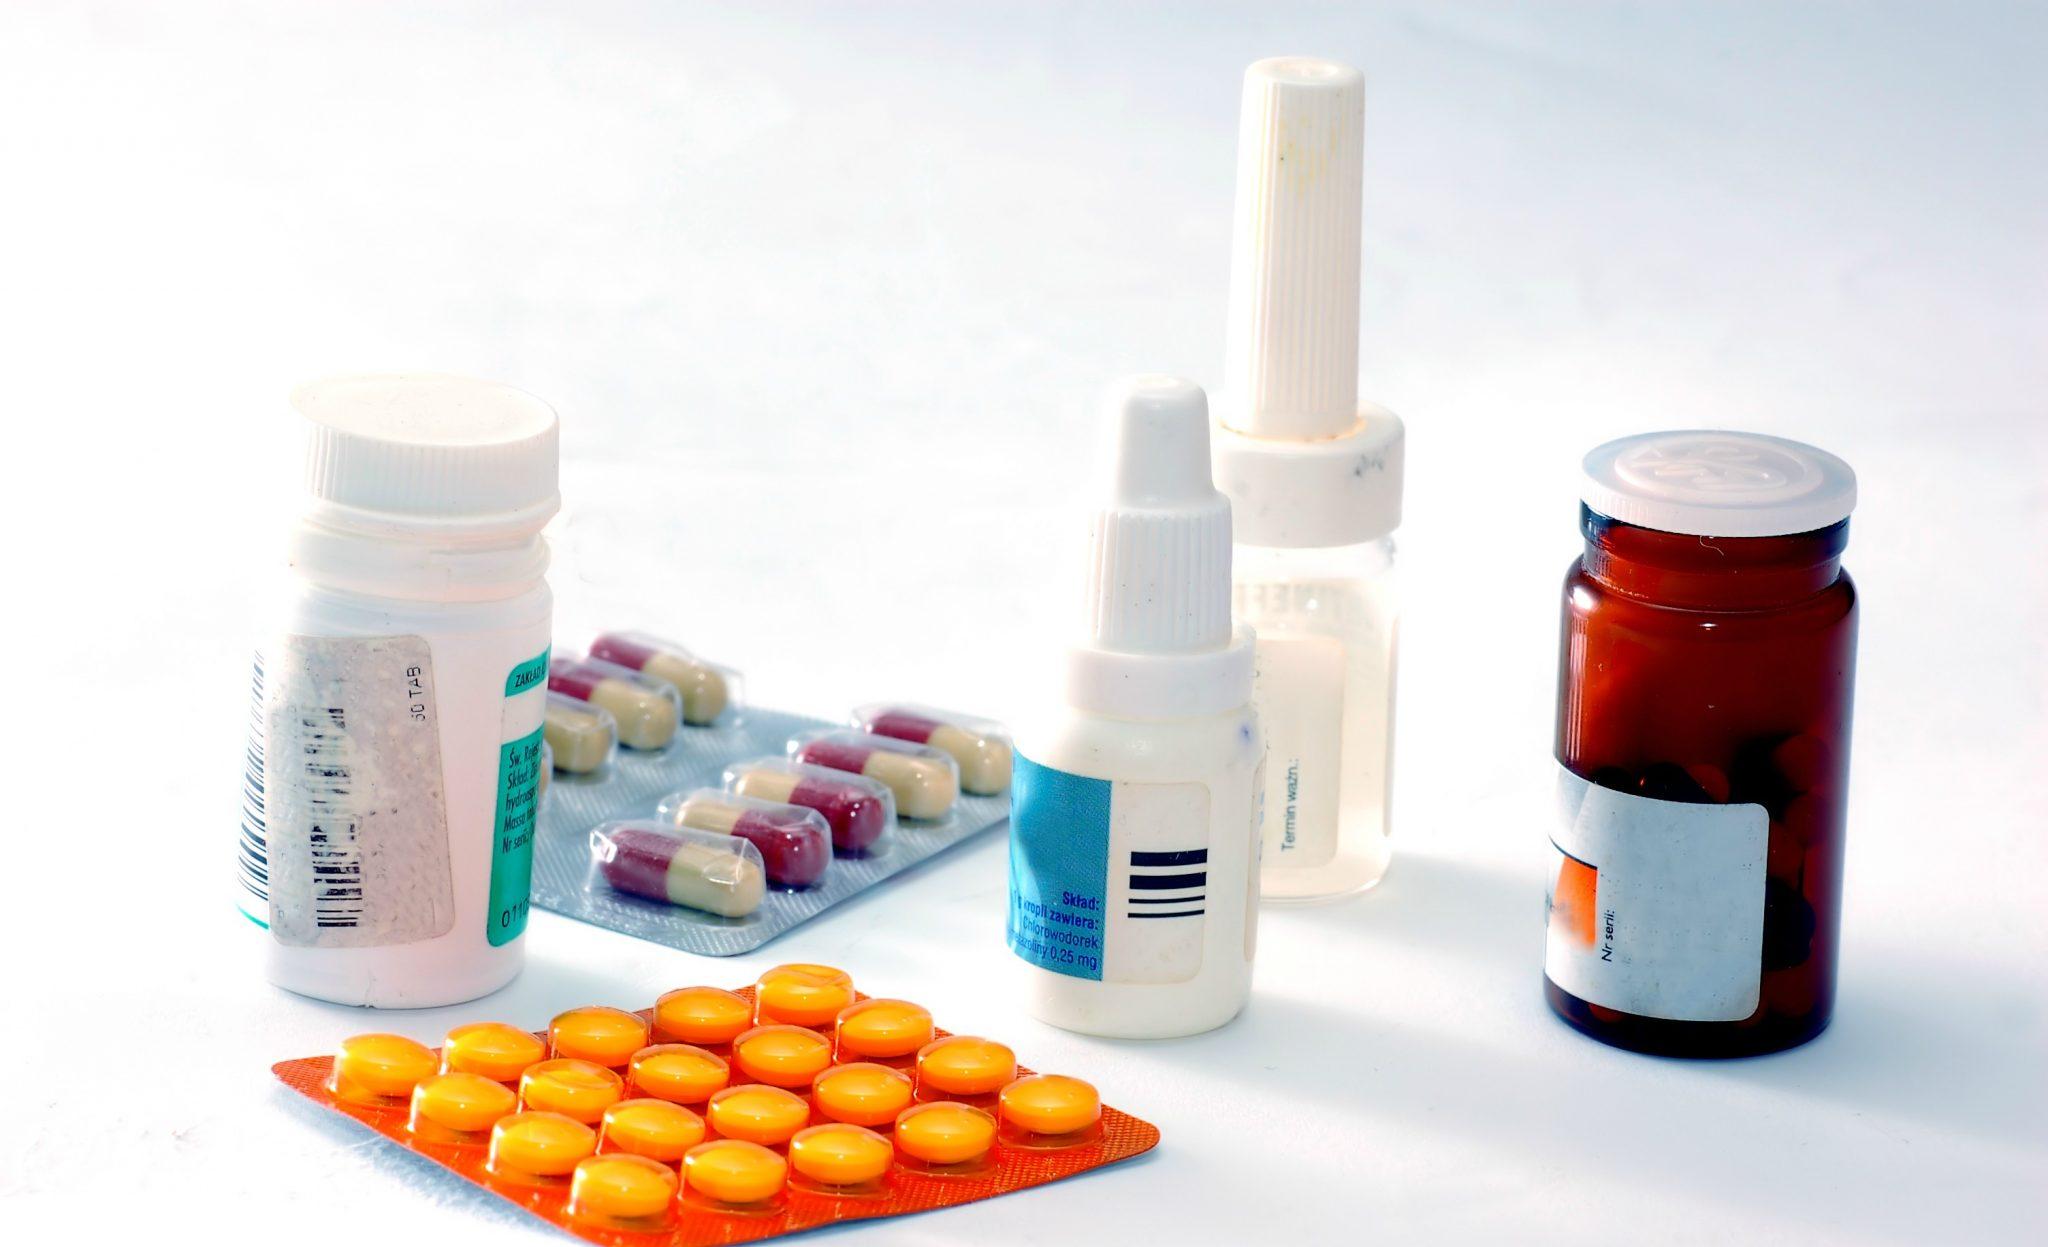 Inova promove webinar sobre pré-alta de medicamentos